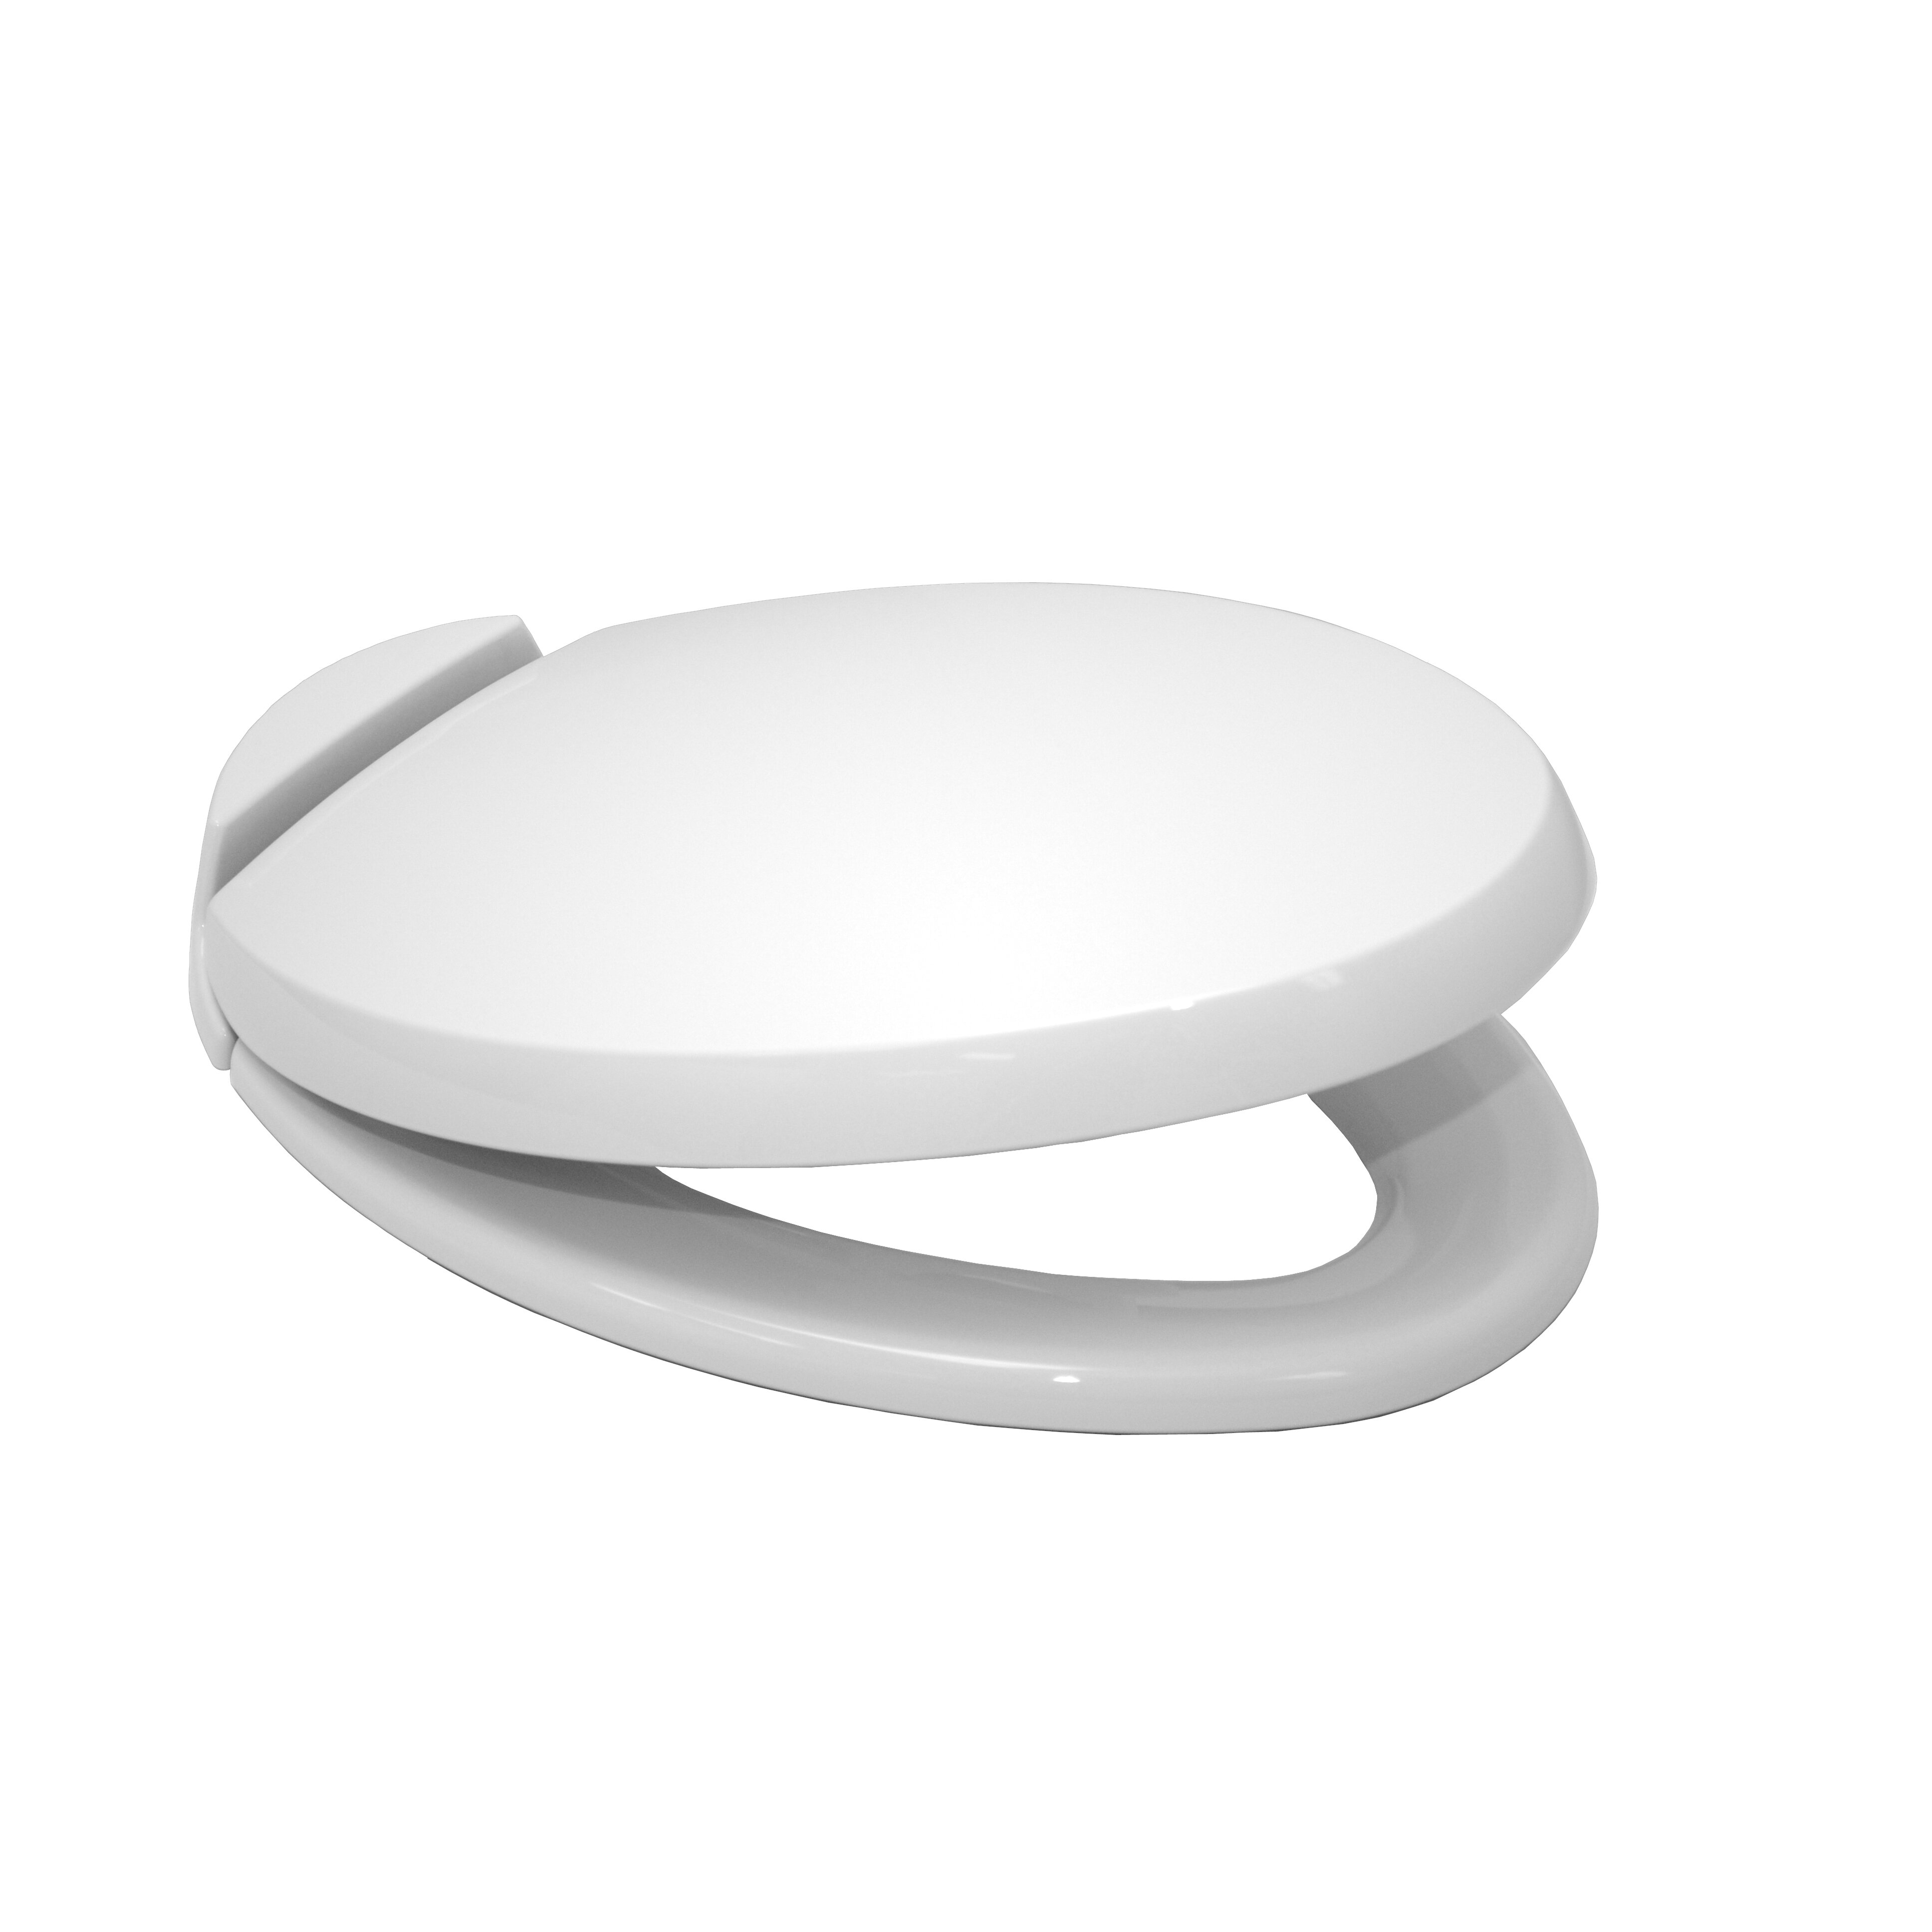 Toto SoftClose Elongated Beveled Lid Toilet Seat  Reviews Wayfair - Toto japanese toilet seat